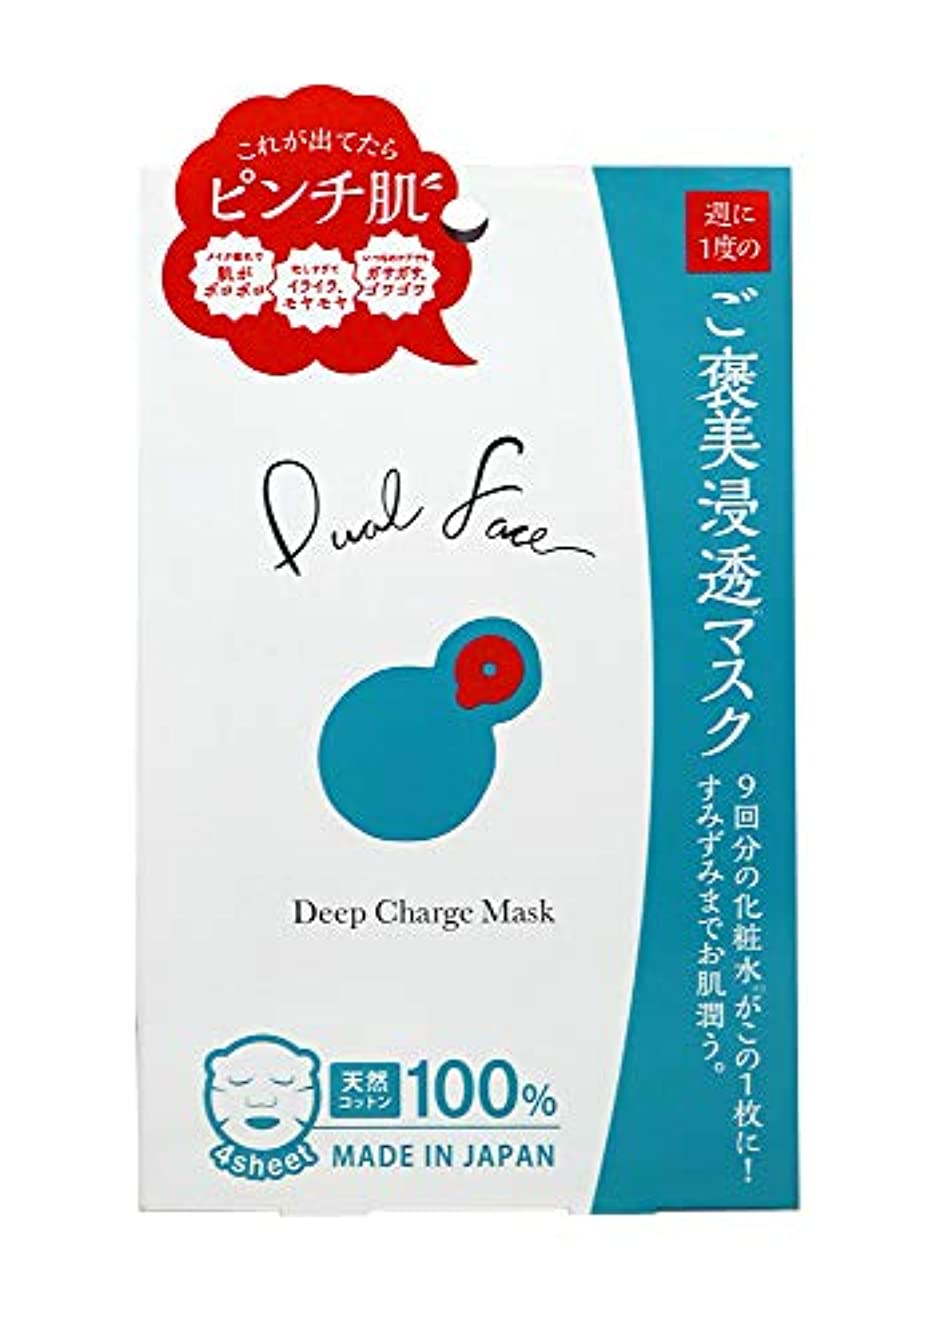 DualFace ディープチャージマスク